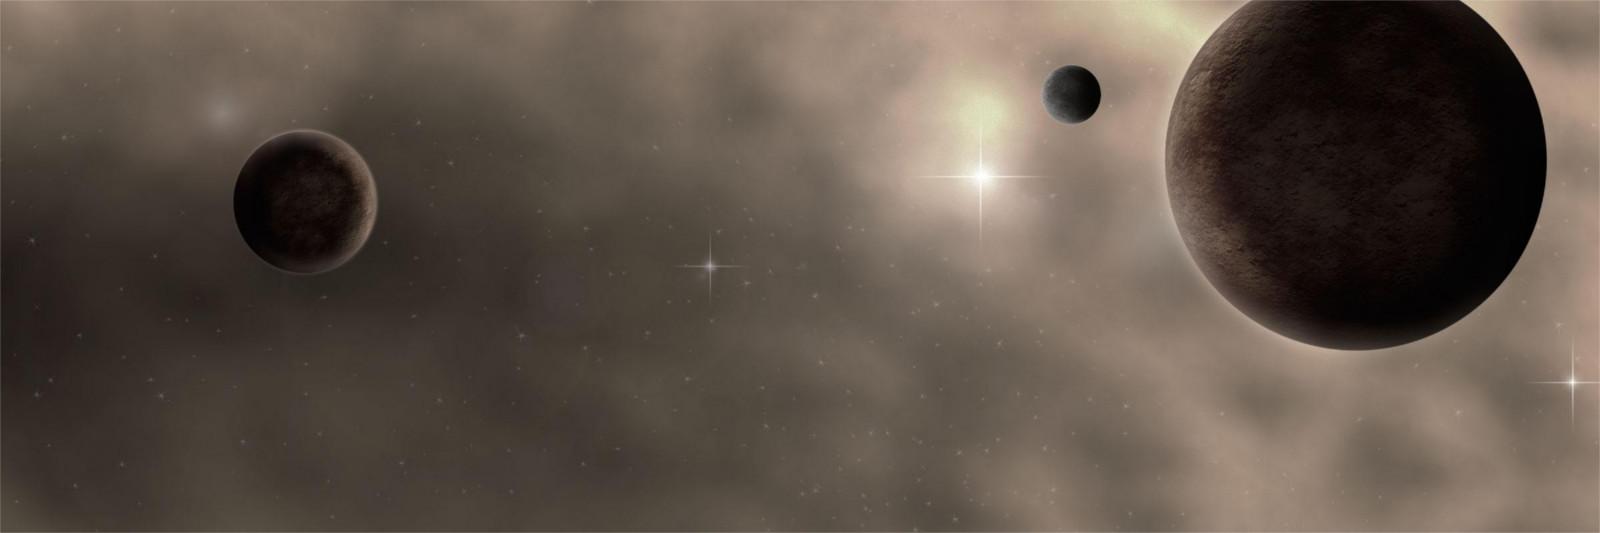 Effect of Distant Orbiters on Habitability